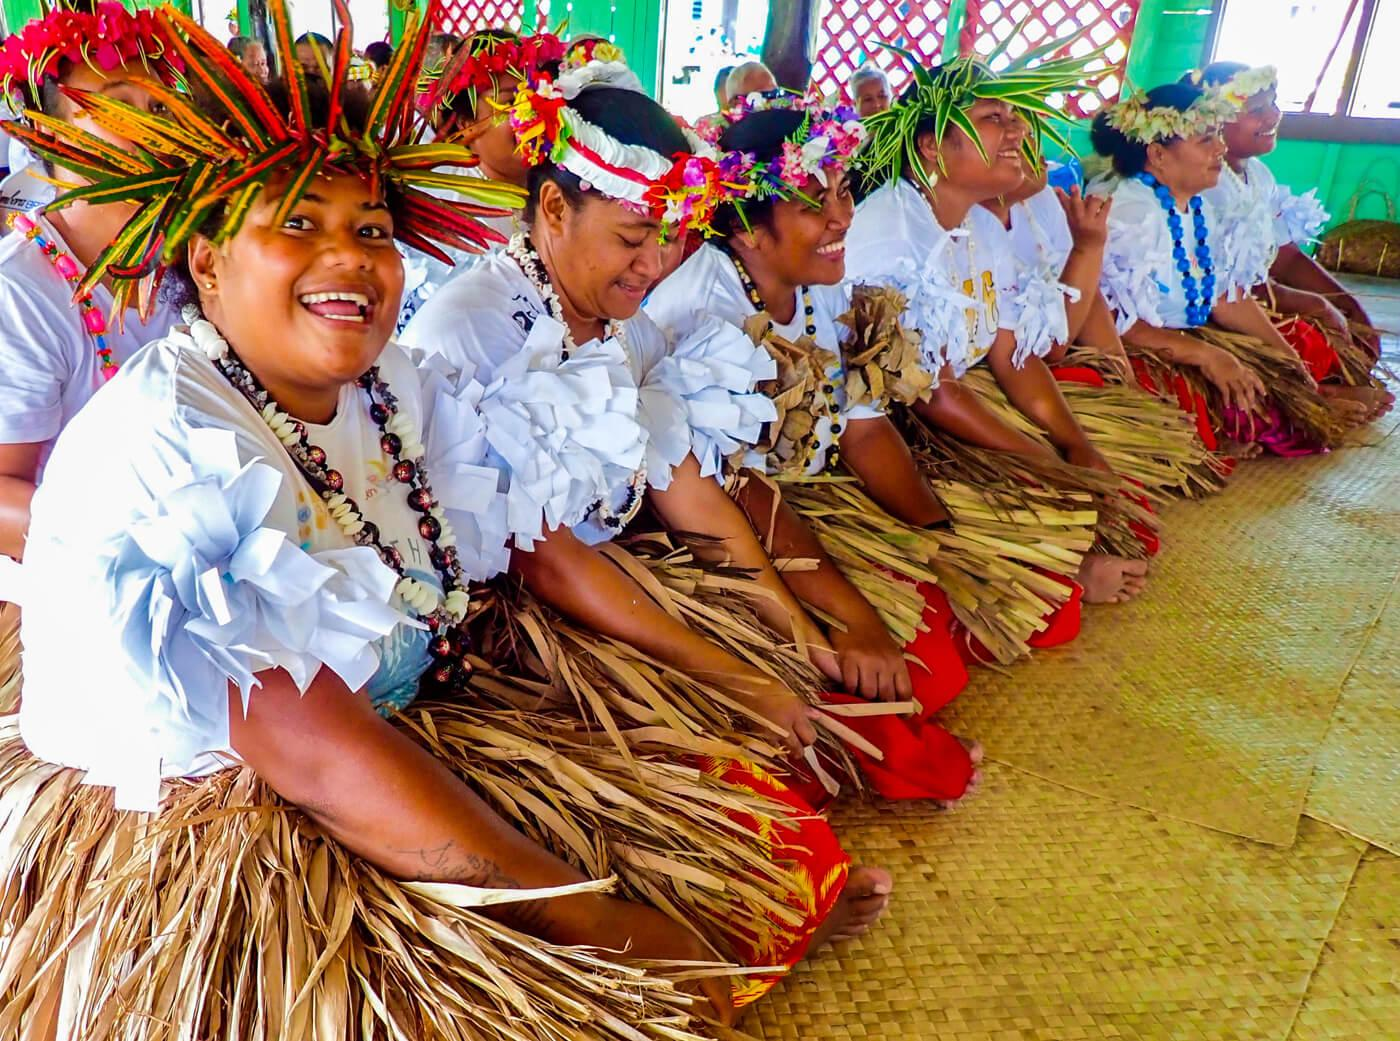 A traditional meke performance at Kioa Island. © Roger Harris